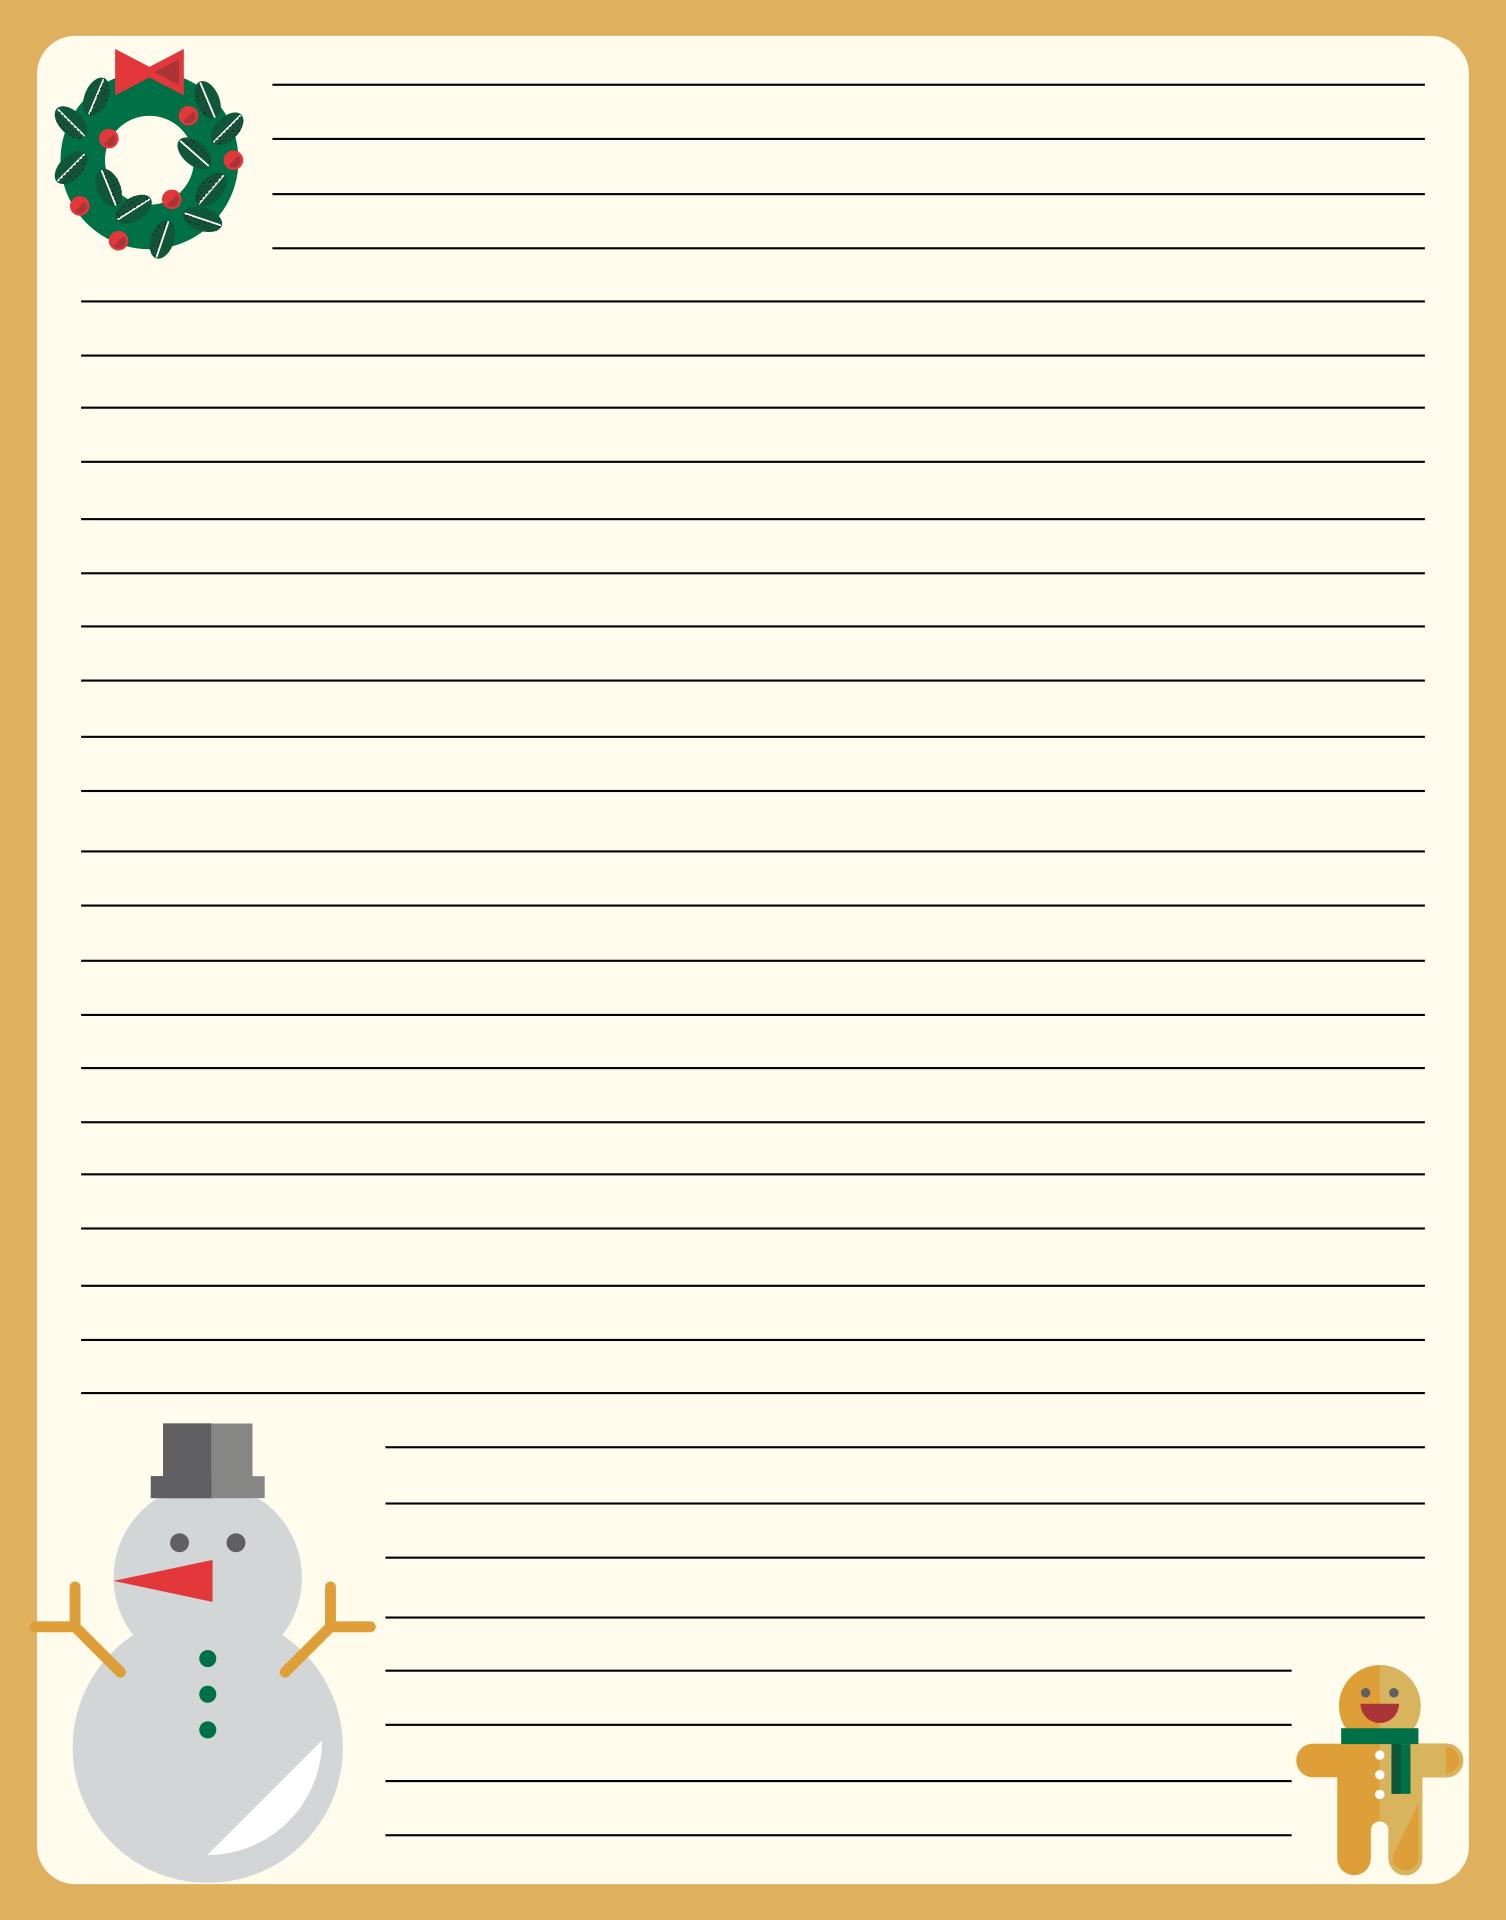 Printable Christmas Stationery Designs